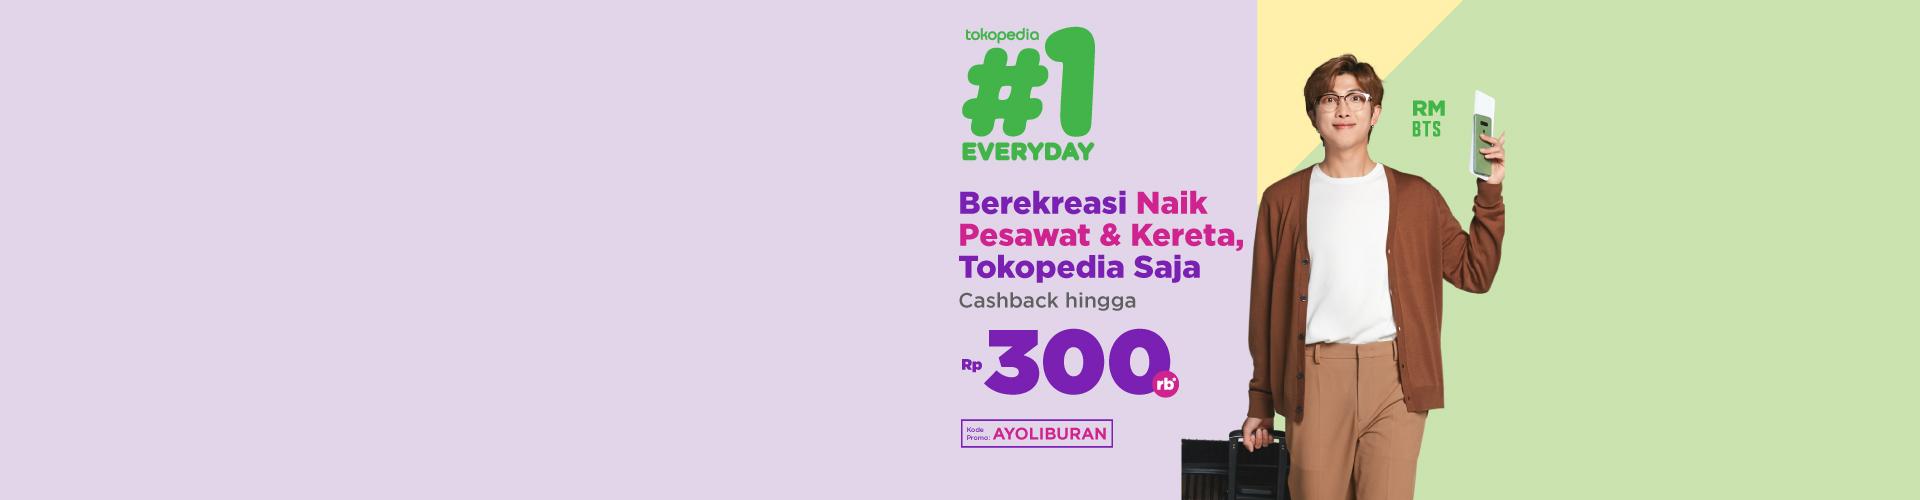 Buat Tiket Kereta, Tokopedia Saja Cashback hingga 65 rb*